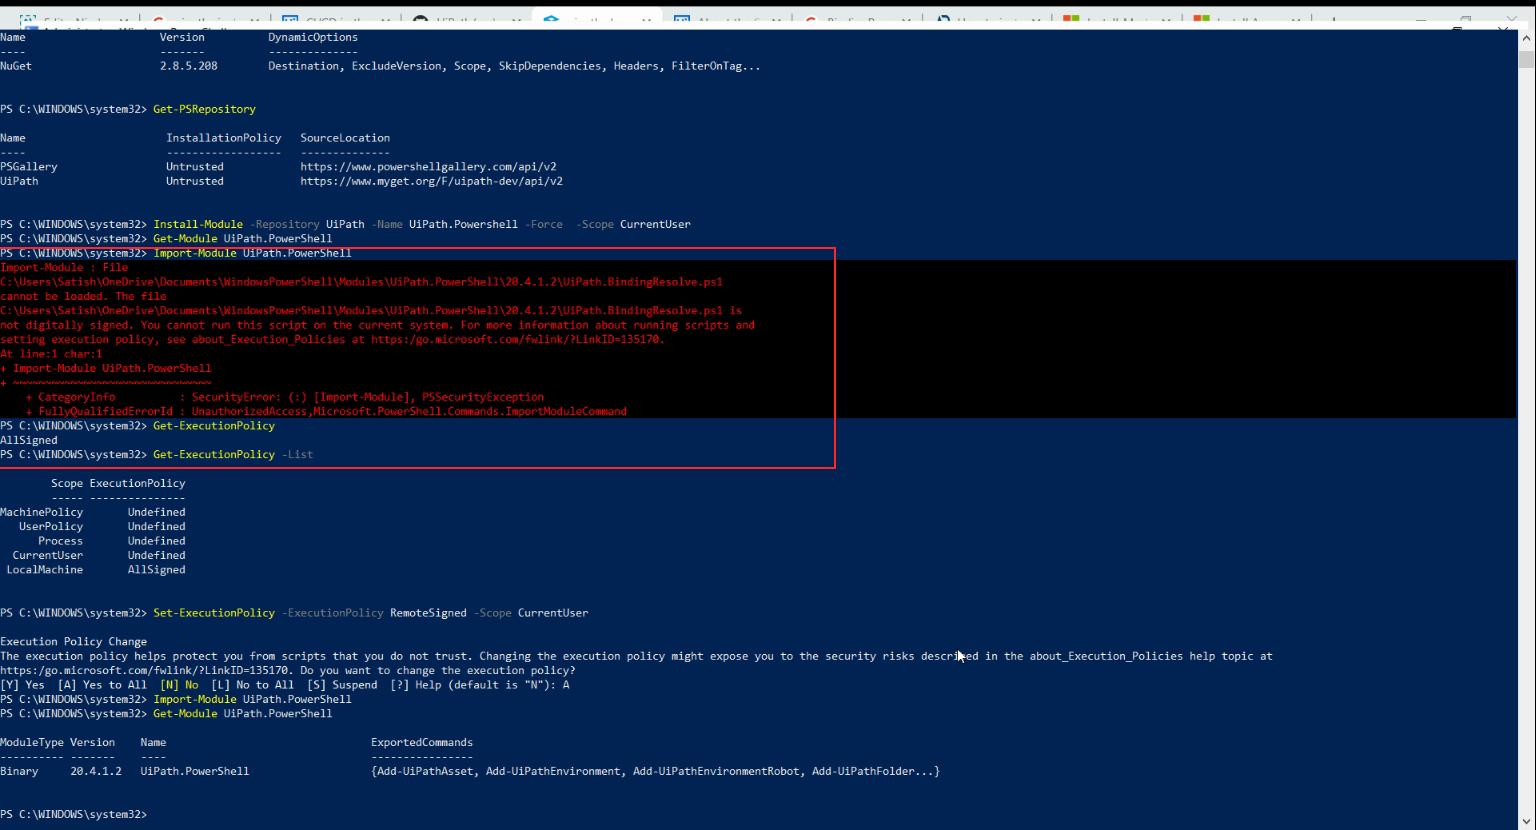 Azure devops UiPath Pipeline Execution Jobs logs